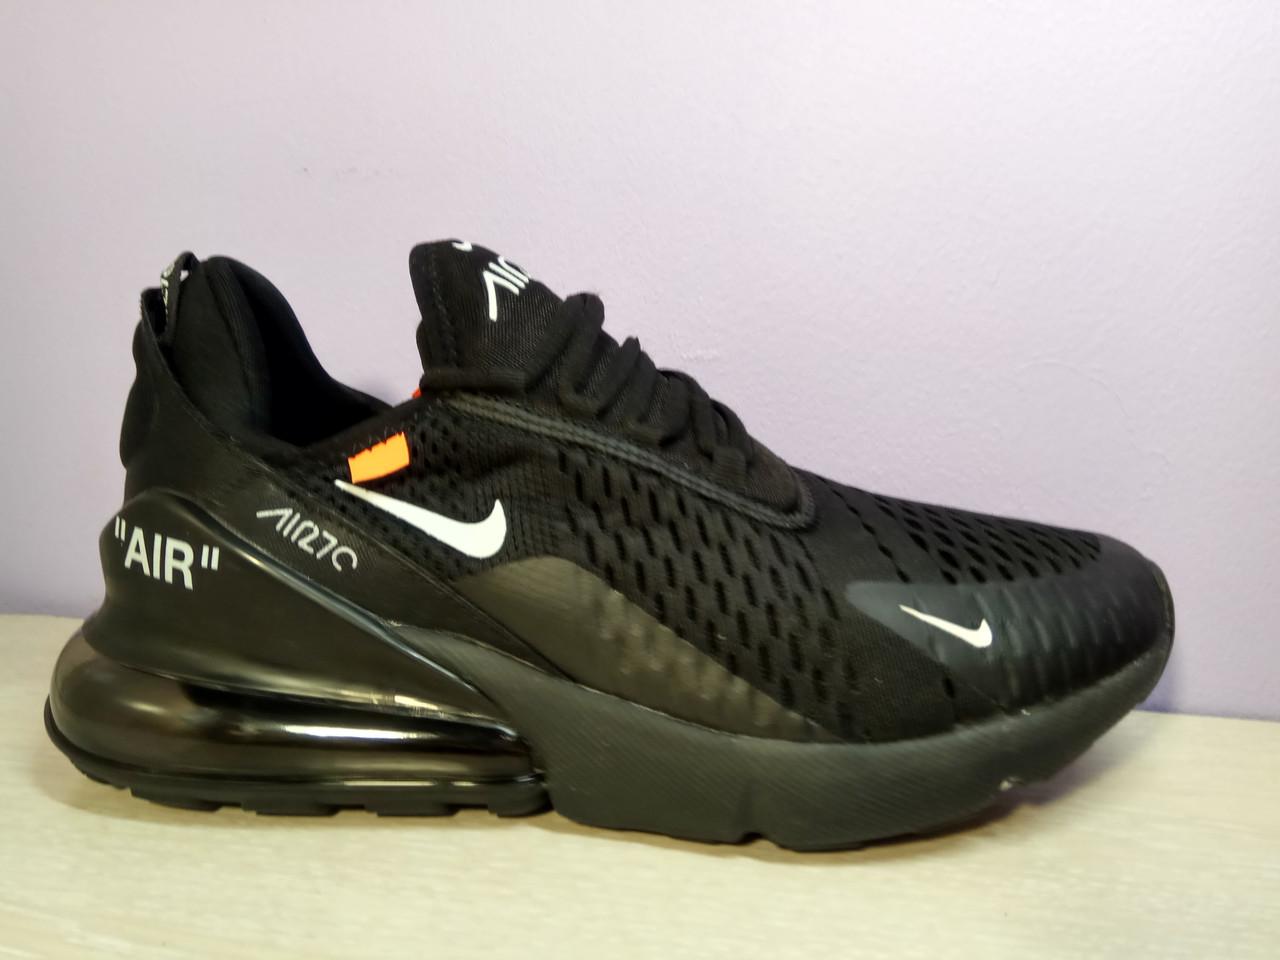 Чоловічі кросівки в стилі Air Max 270 Off Black